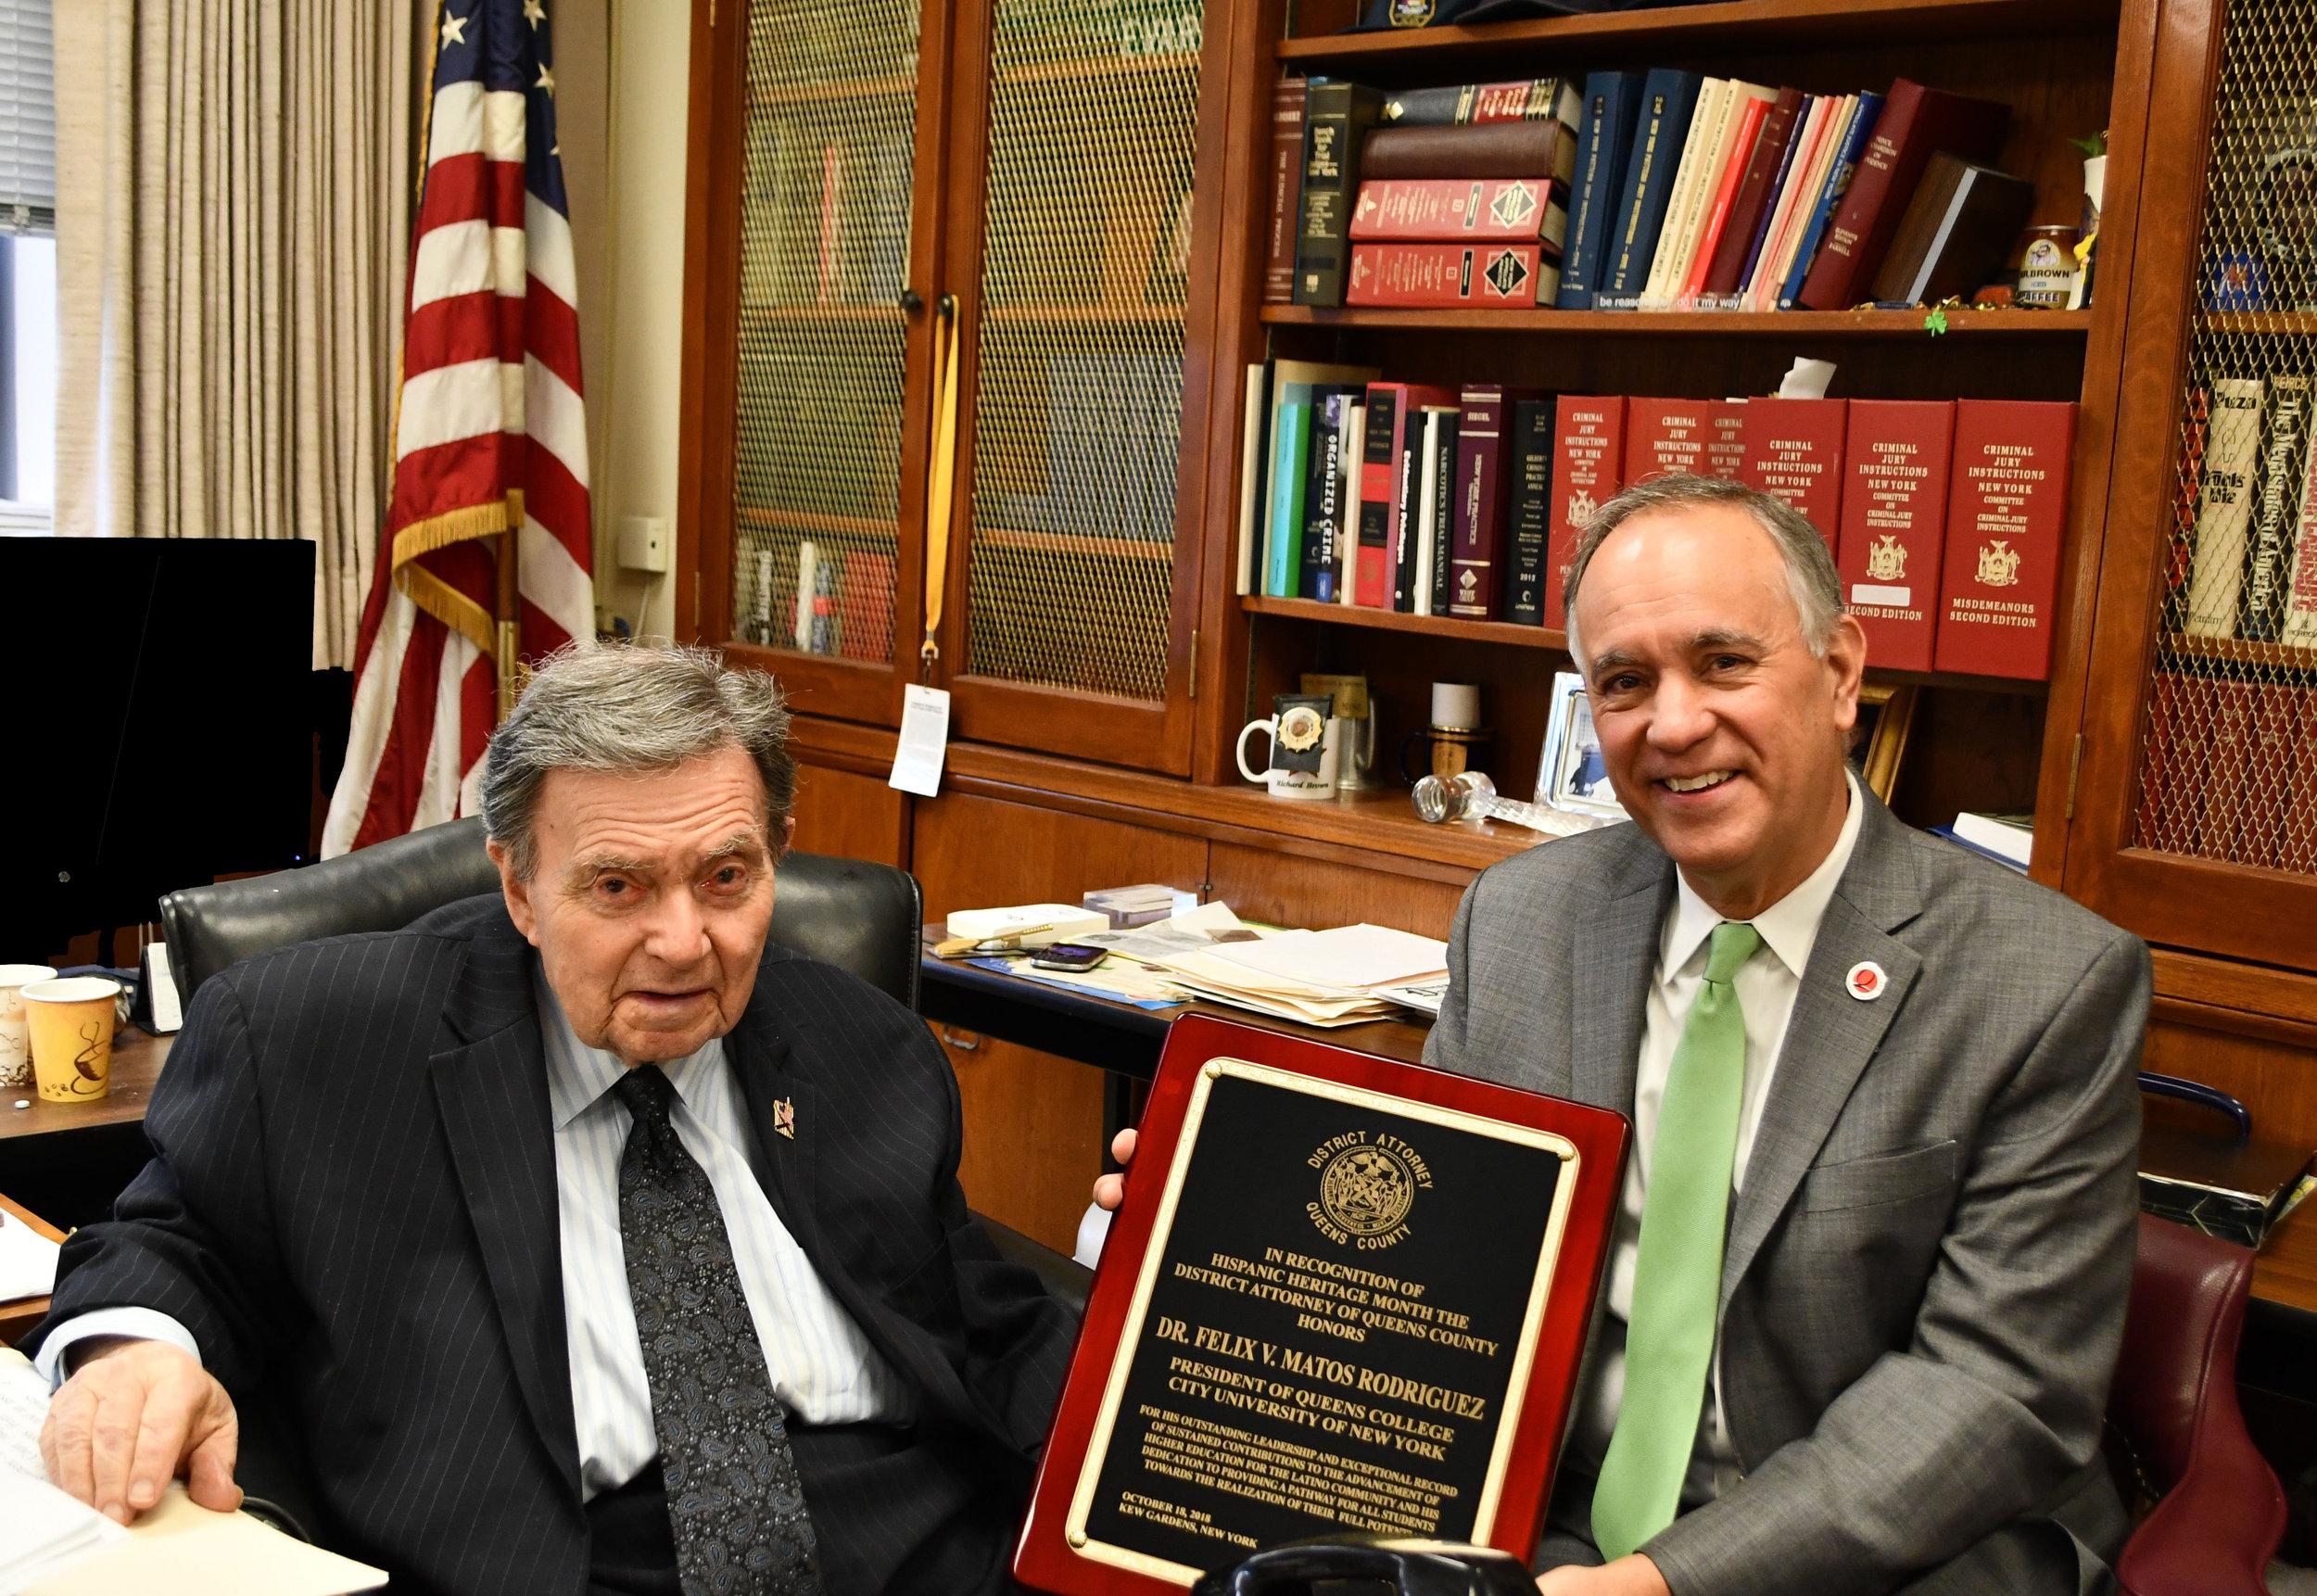 Photo caption: Queens District Attorney Richard A. Brown (left) and Queens College President Fèlix V. Matos Rodríguez. Photo courtesy of DA Brown.